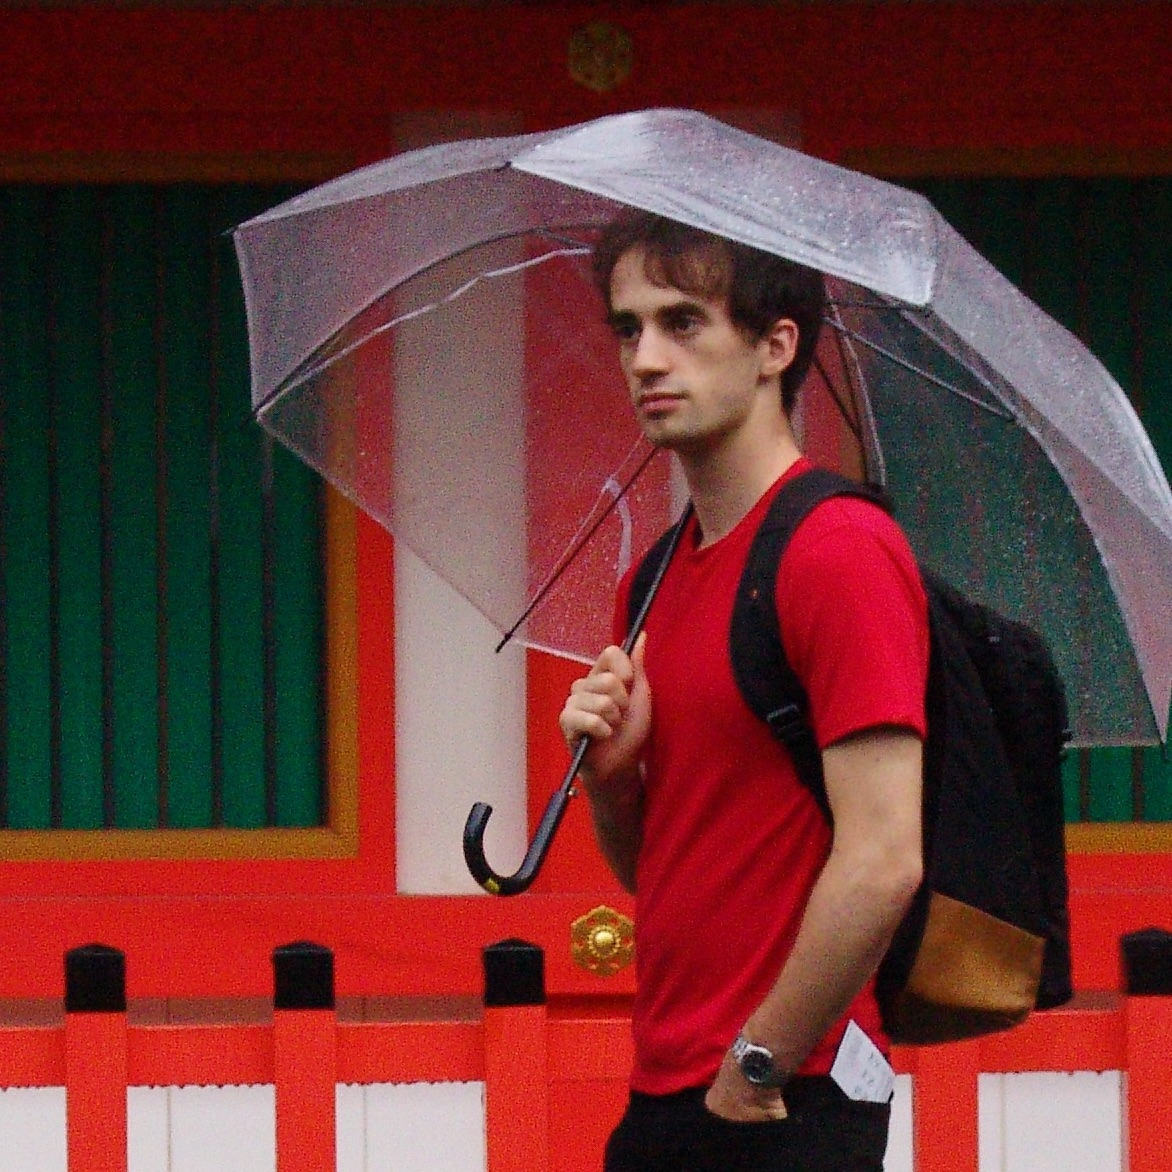 Man in a red t-shirt holding an umbrella